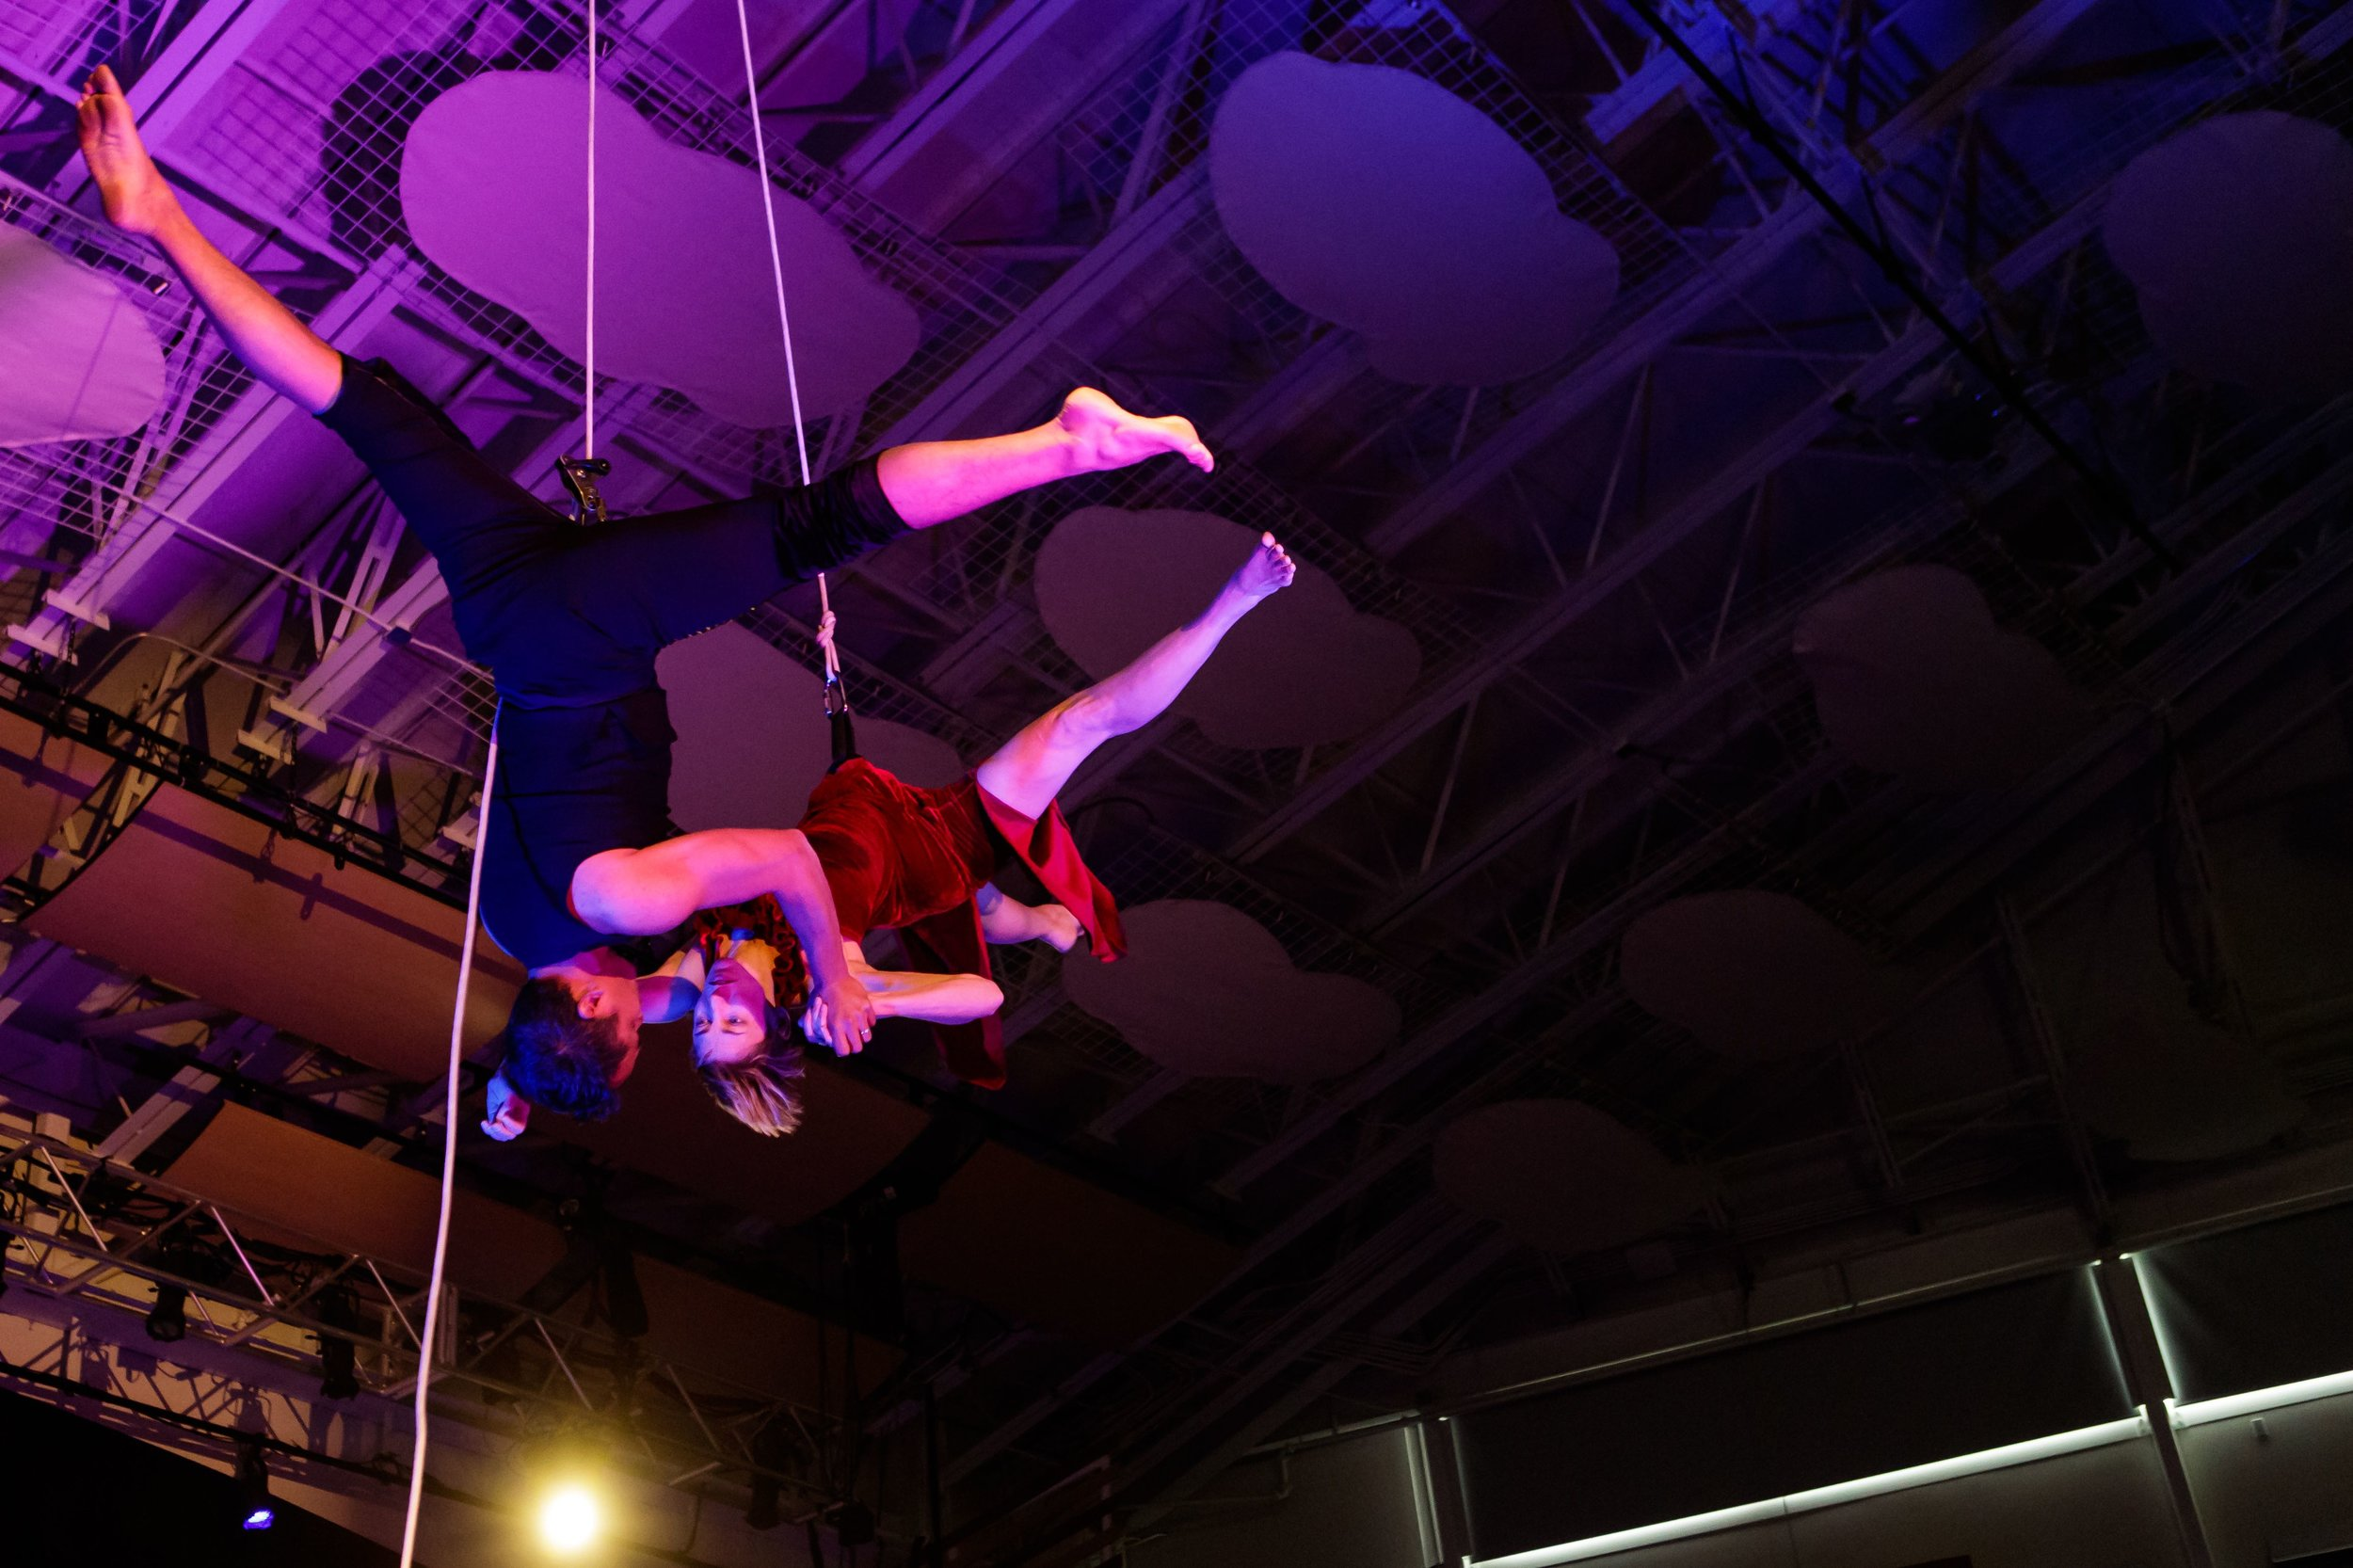 Bandaloop - Interior vertical dance | Breckenridge 2019